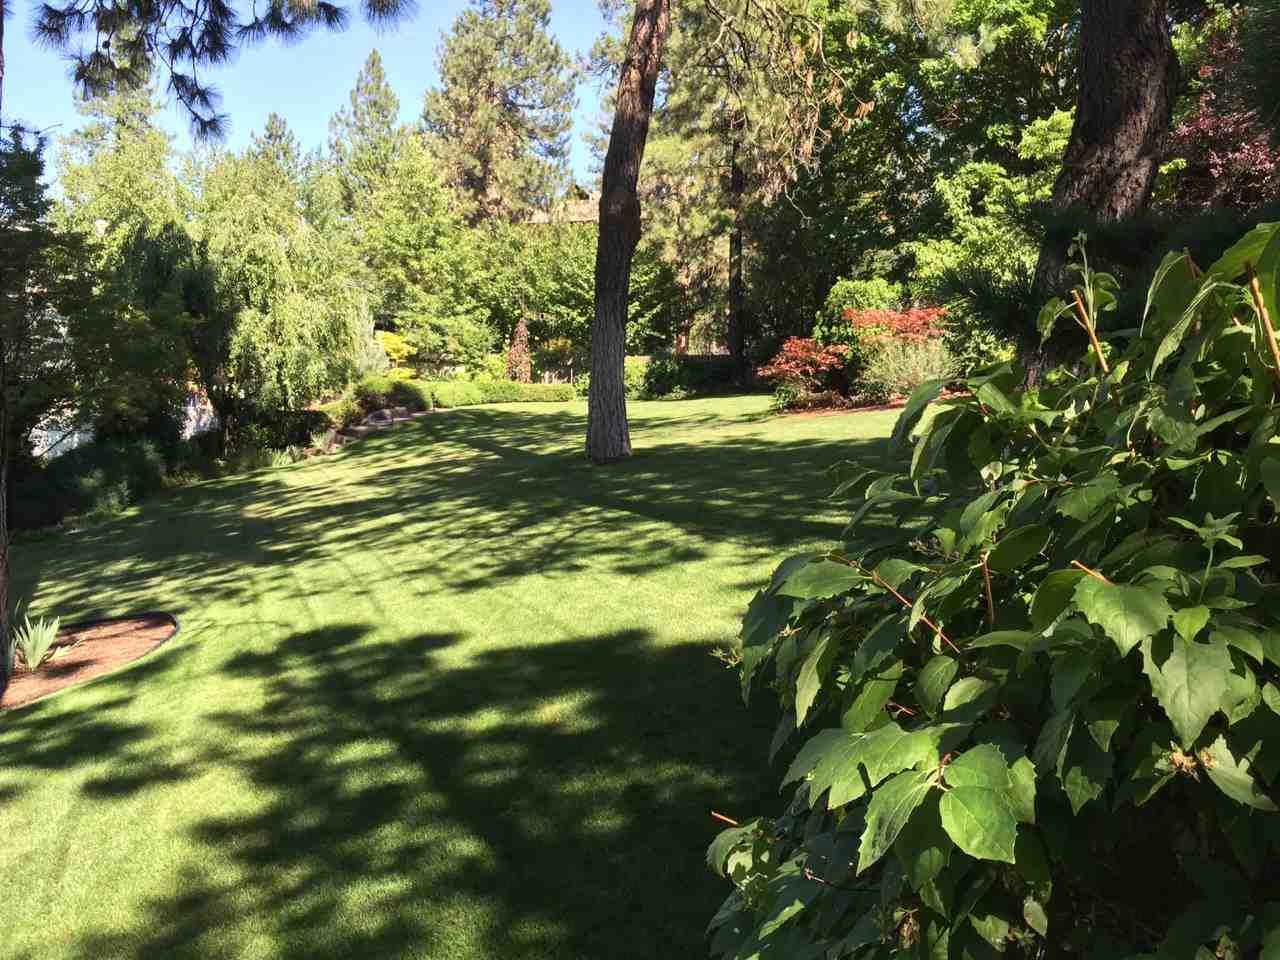 1612 S Crest Hill Dr , Spokane, WA - USA (photo 5)